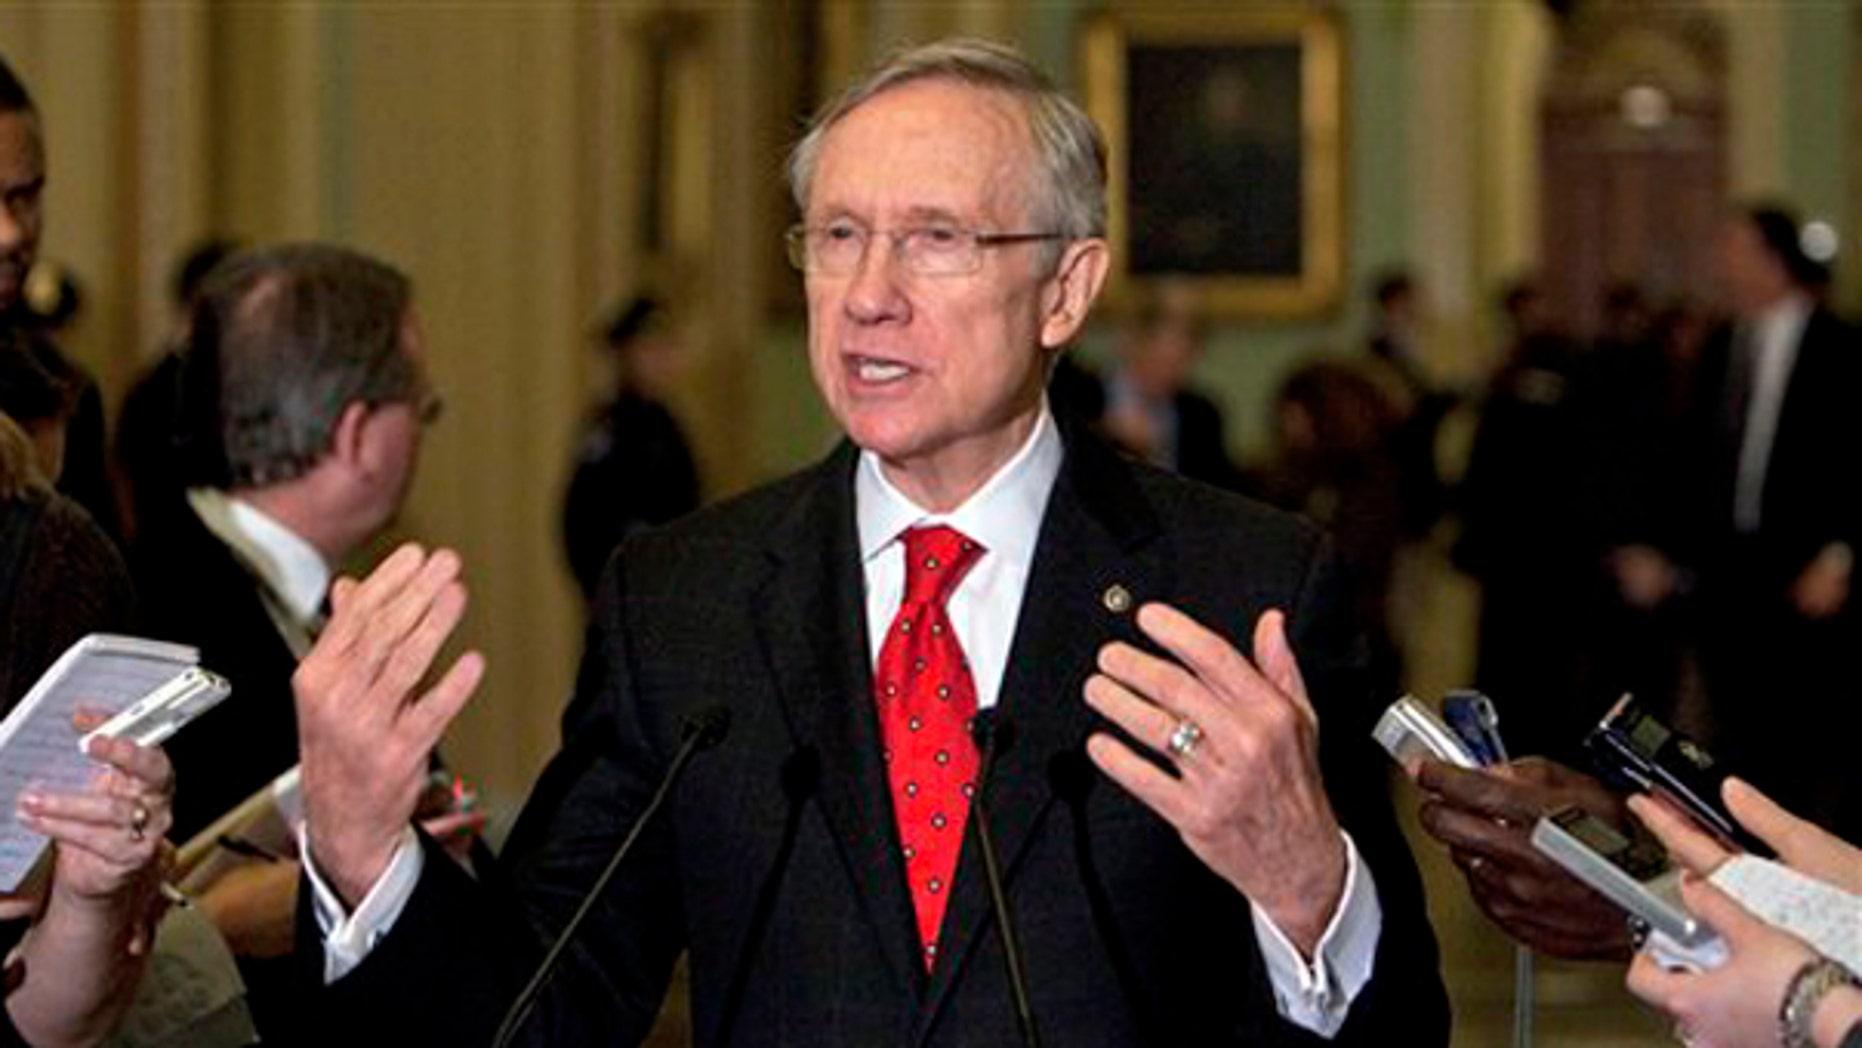 Senate Majority Leader Harry Reid talks to reporters in Washington Dec. 6. (AP Photo)